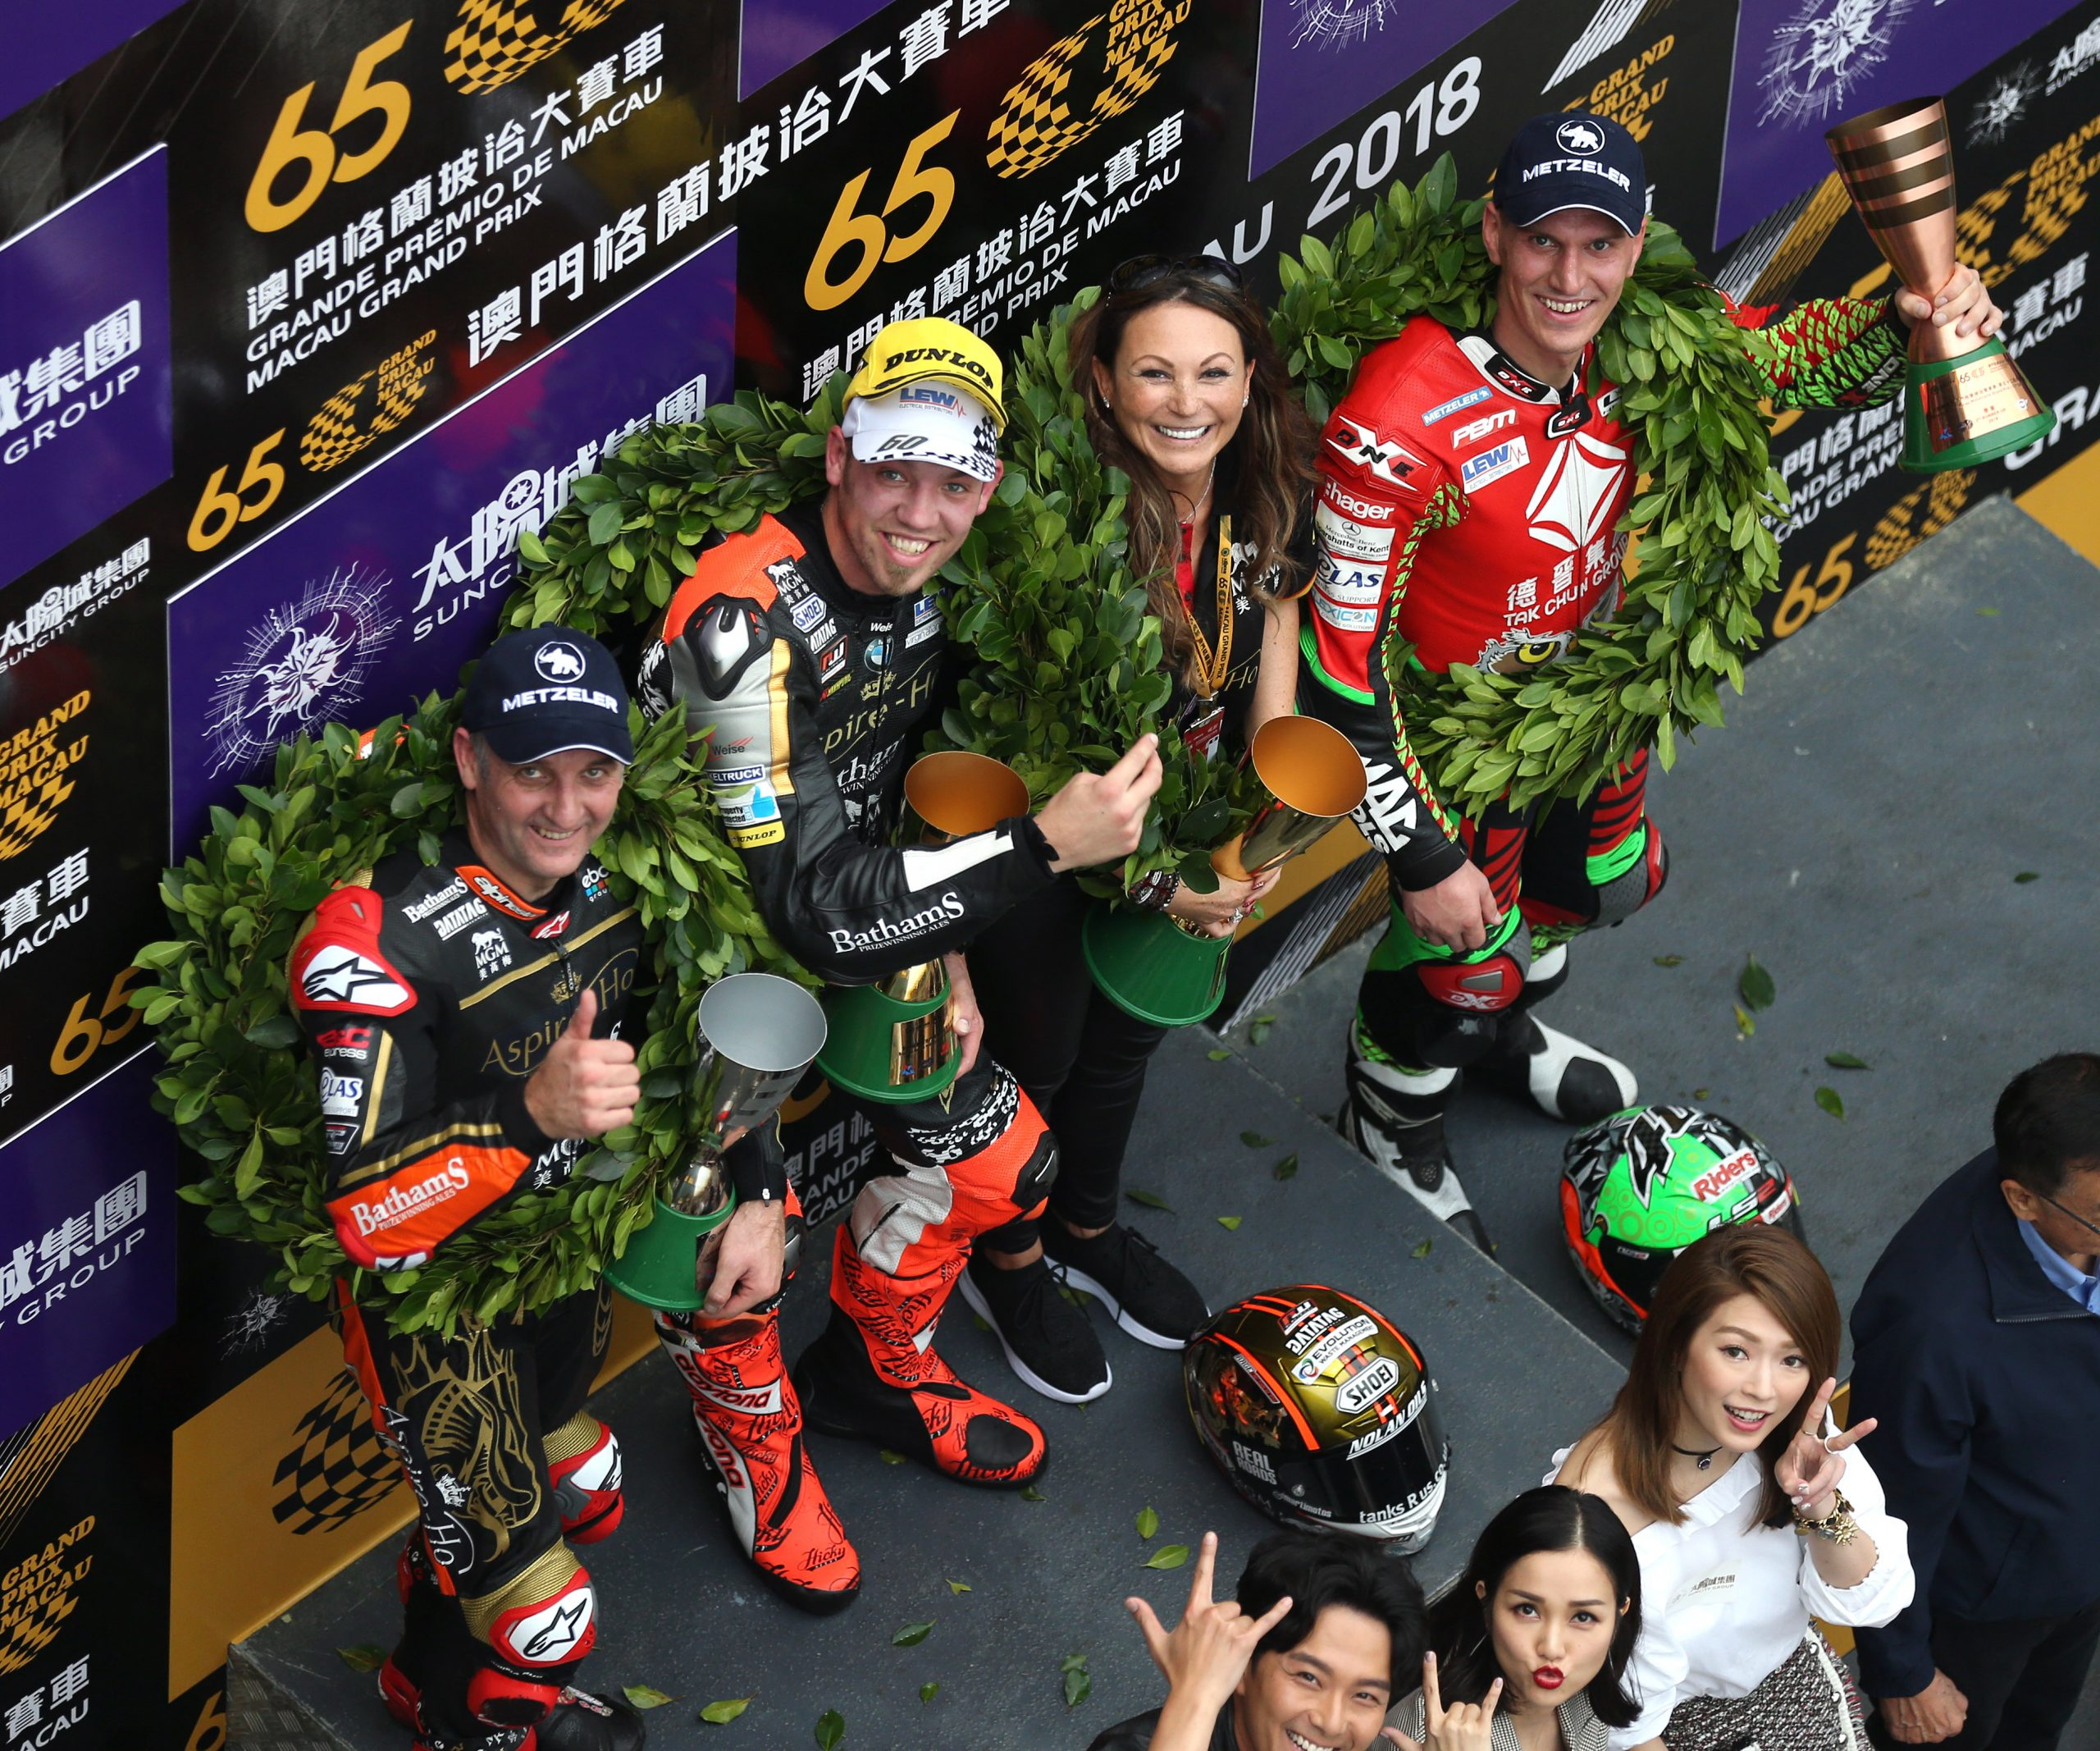 2018 Macau GP Podium winners